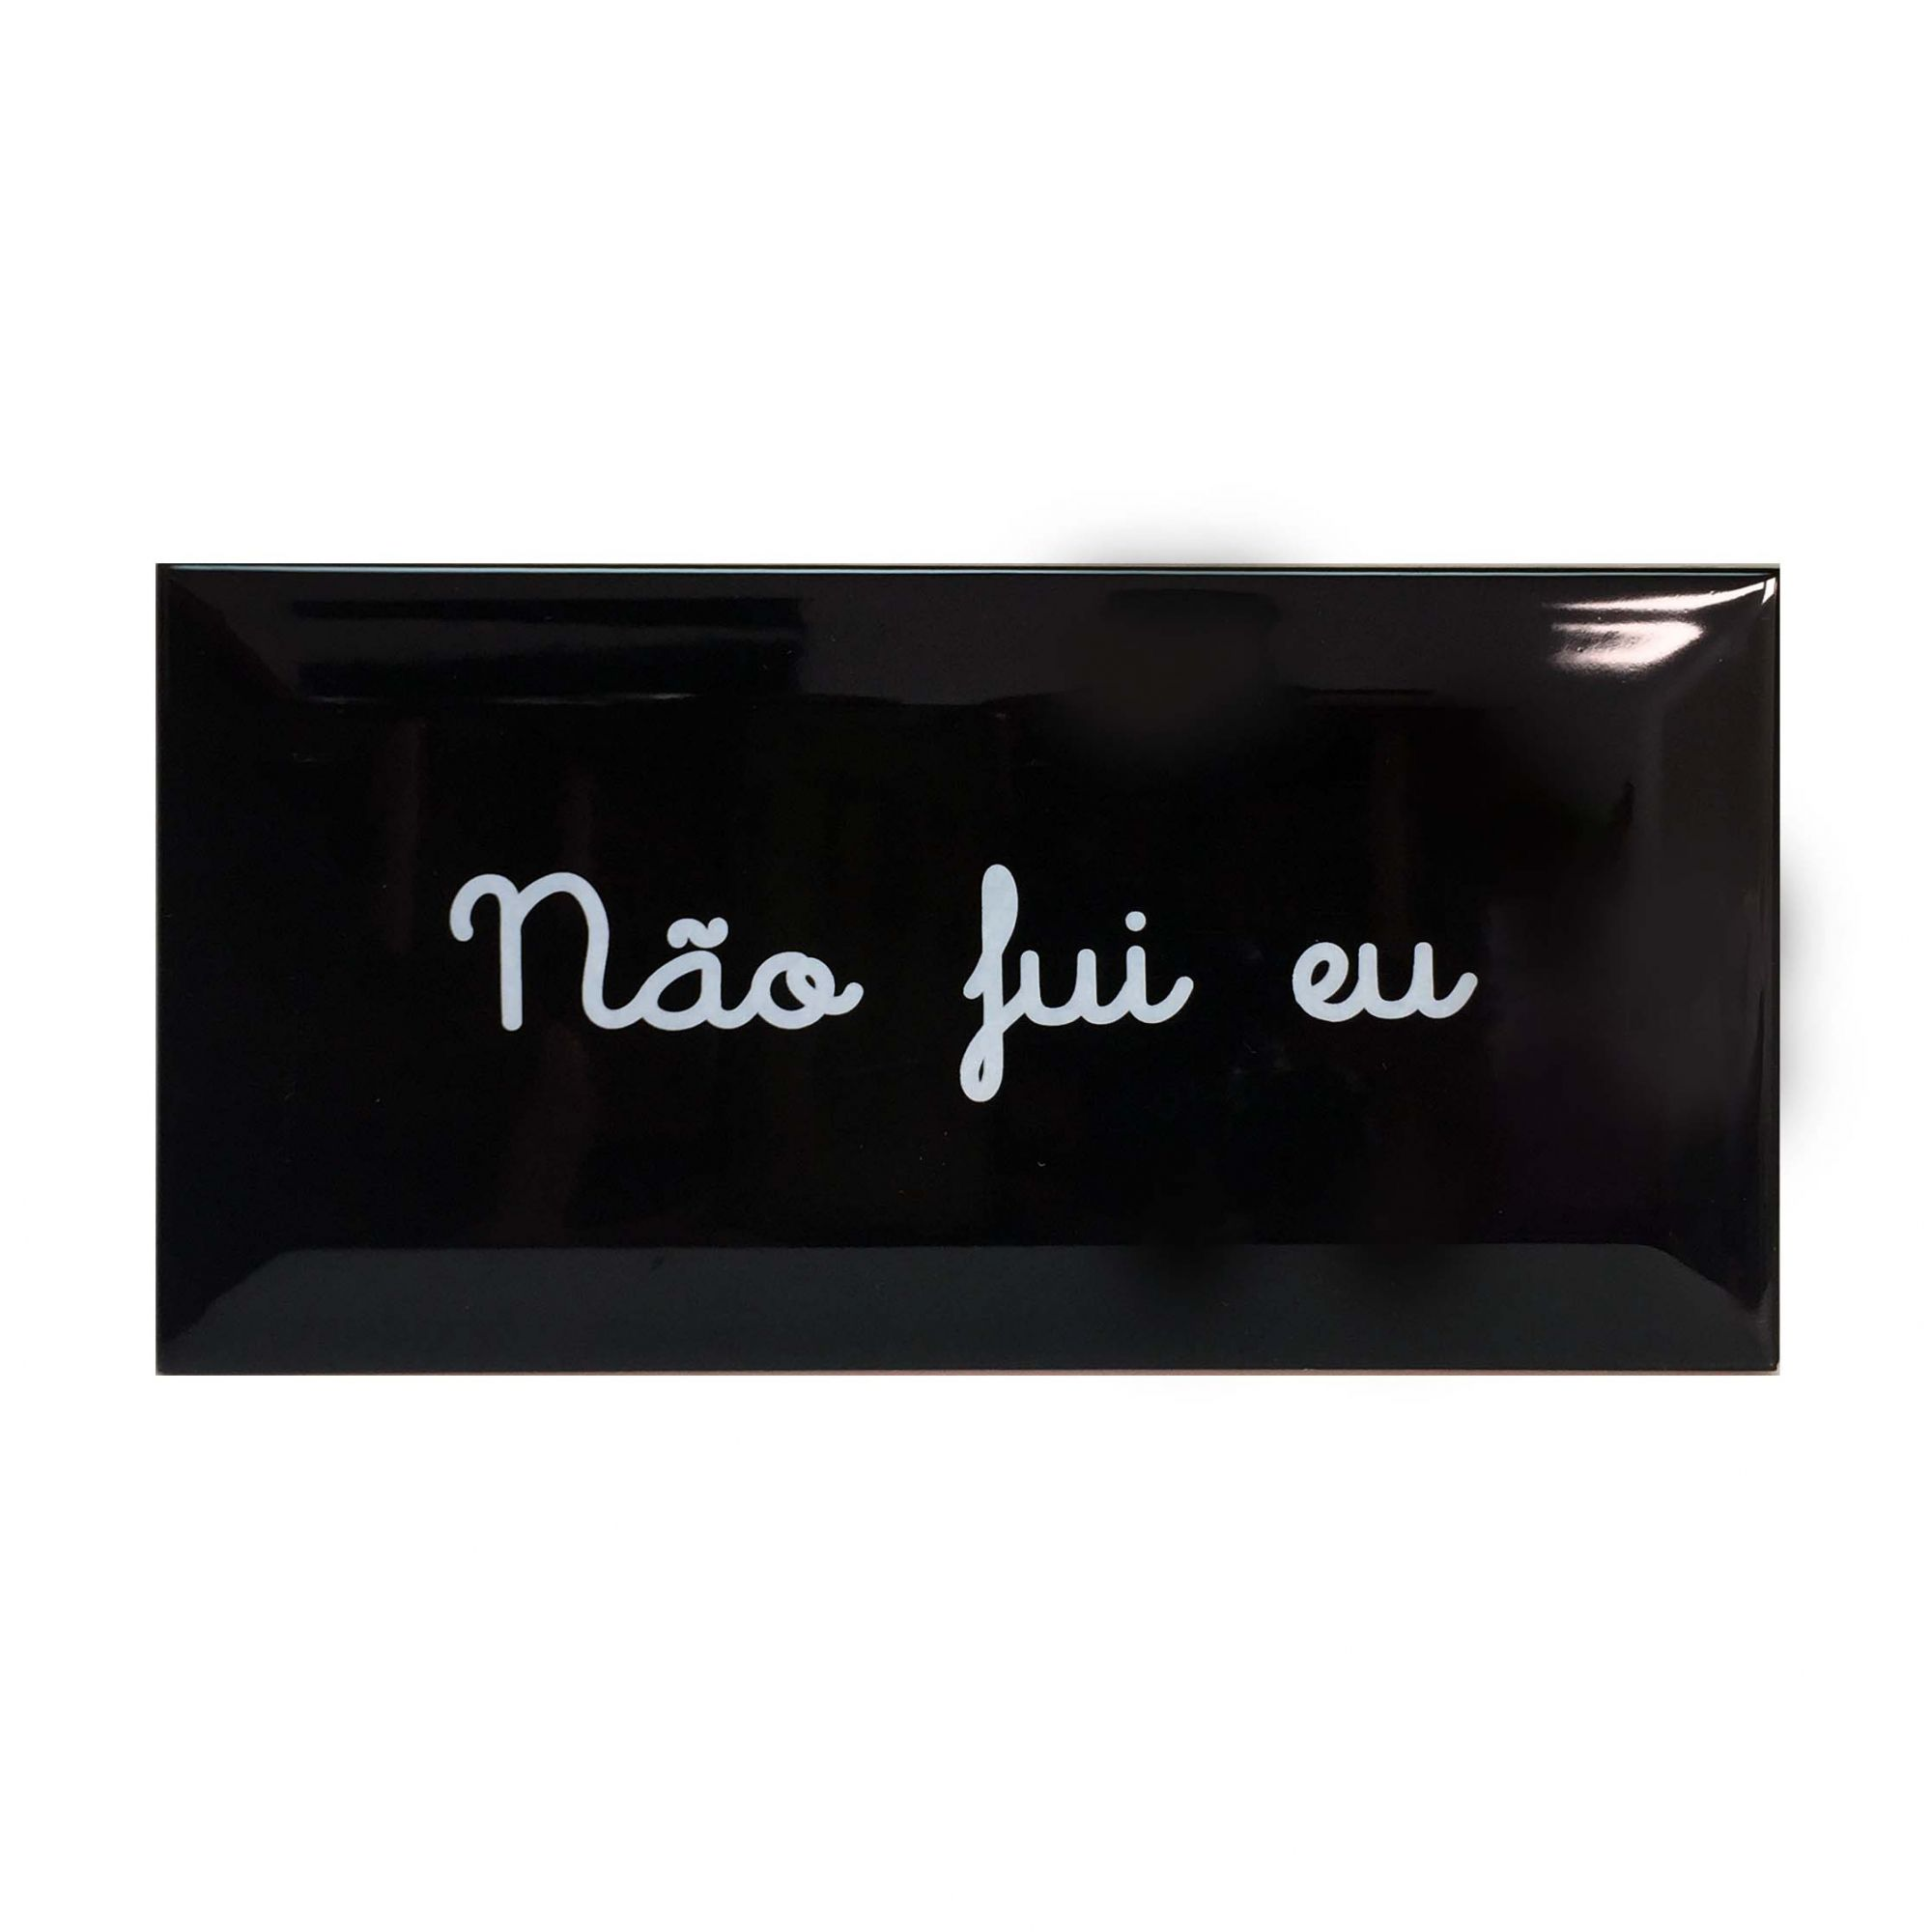 Azulejo Retangular Preto com Escrito Branco